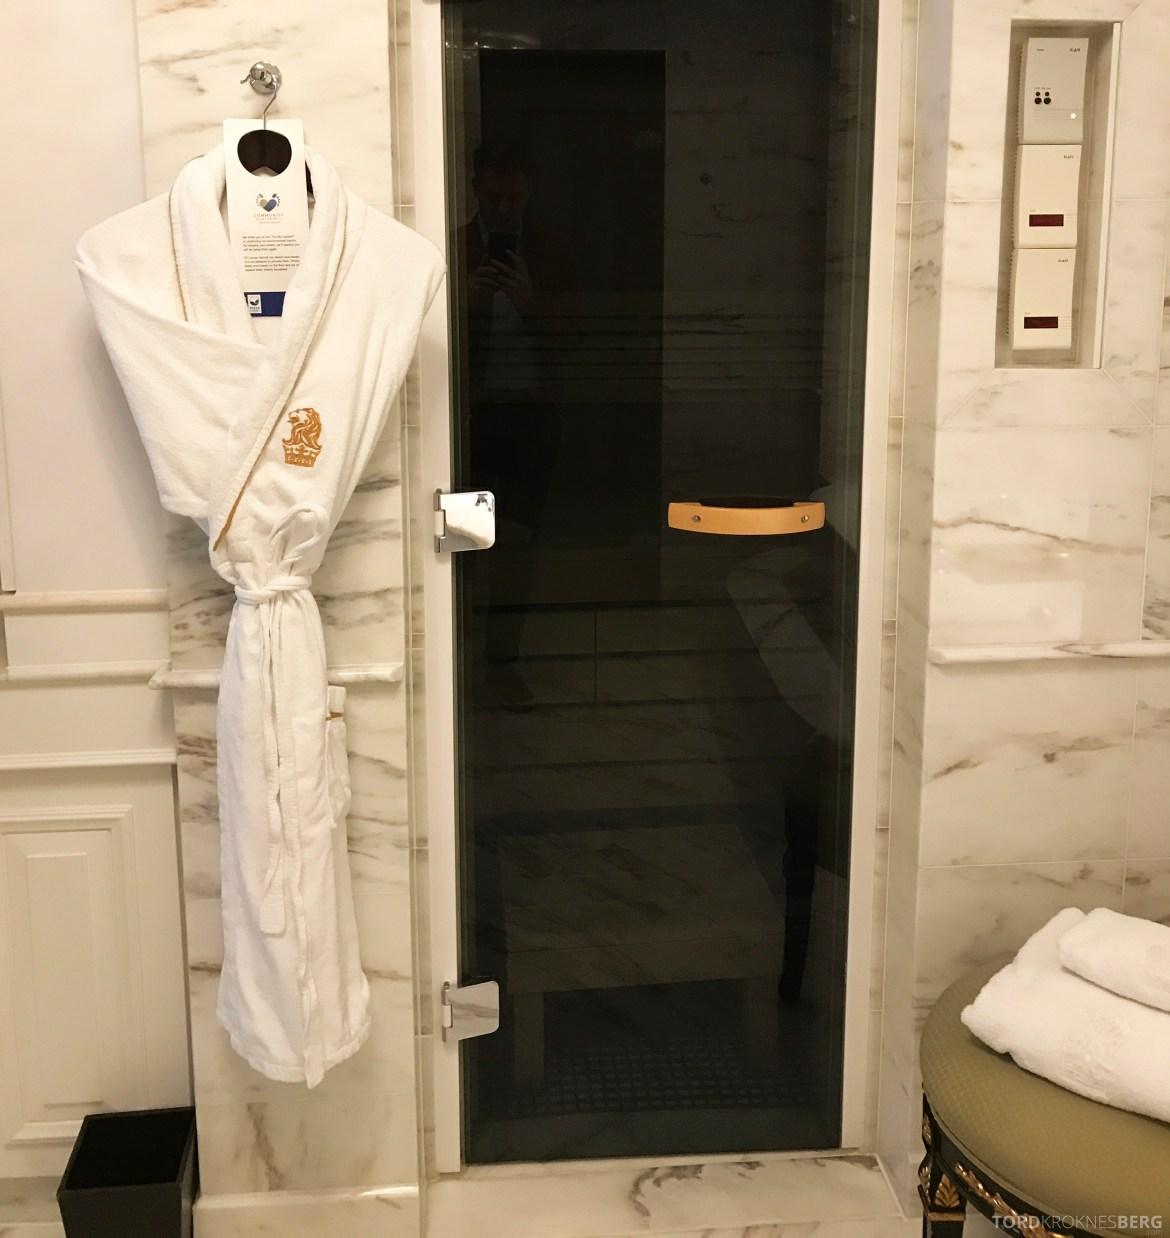 Ritz-Carlton Berlin Presidential Suite badsstue